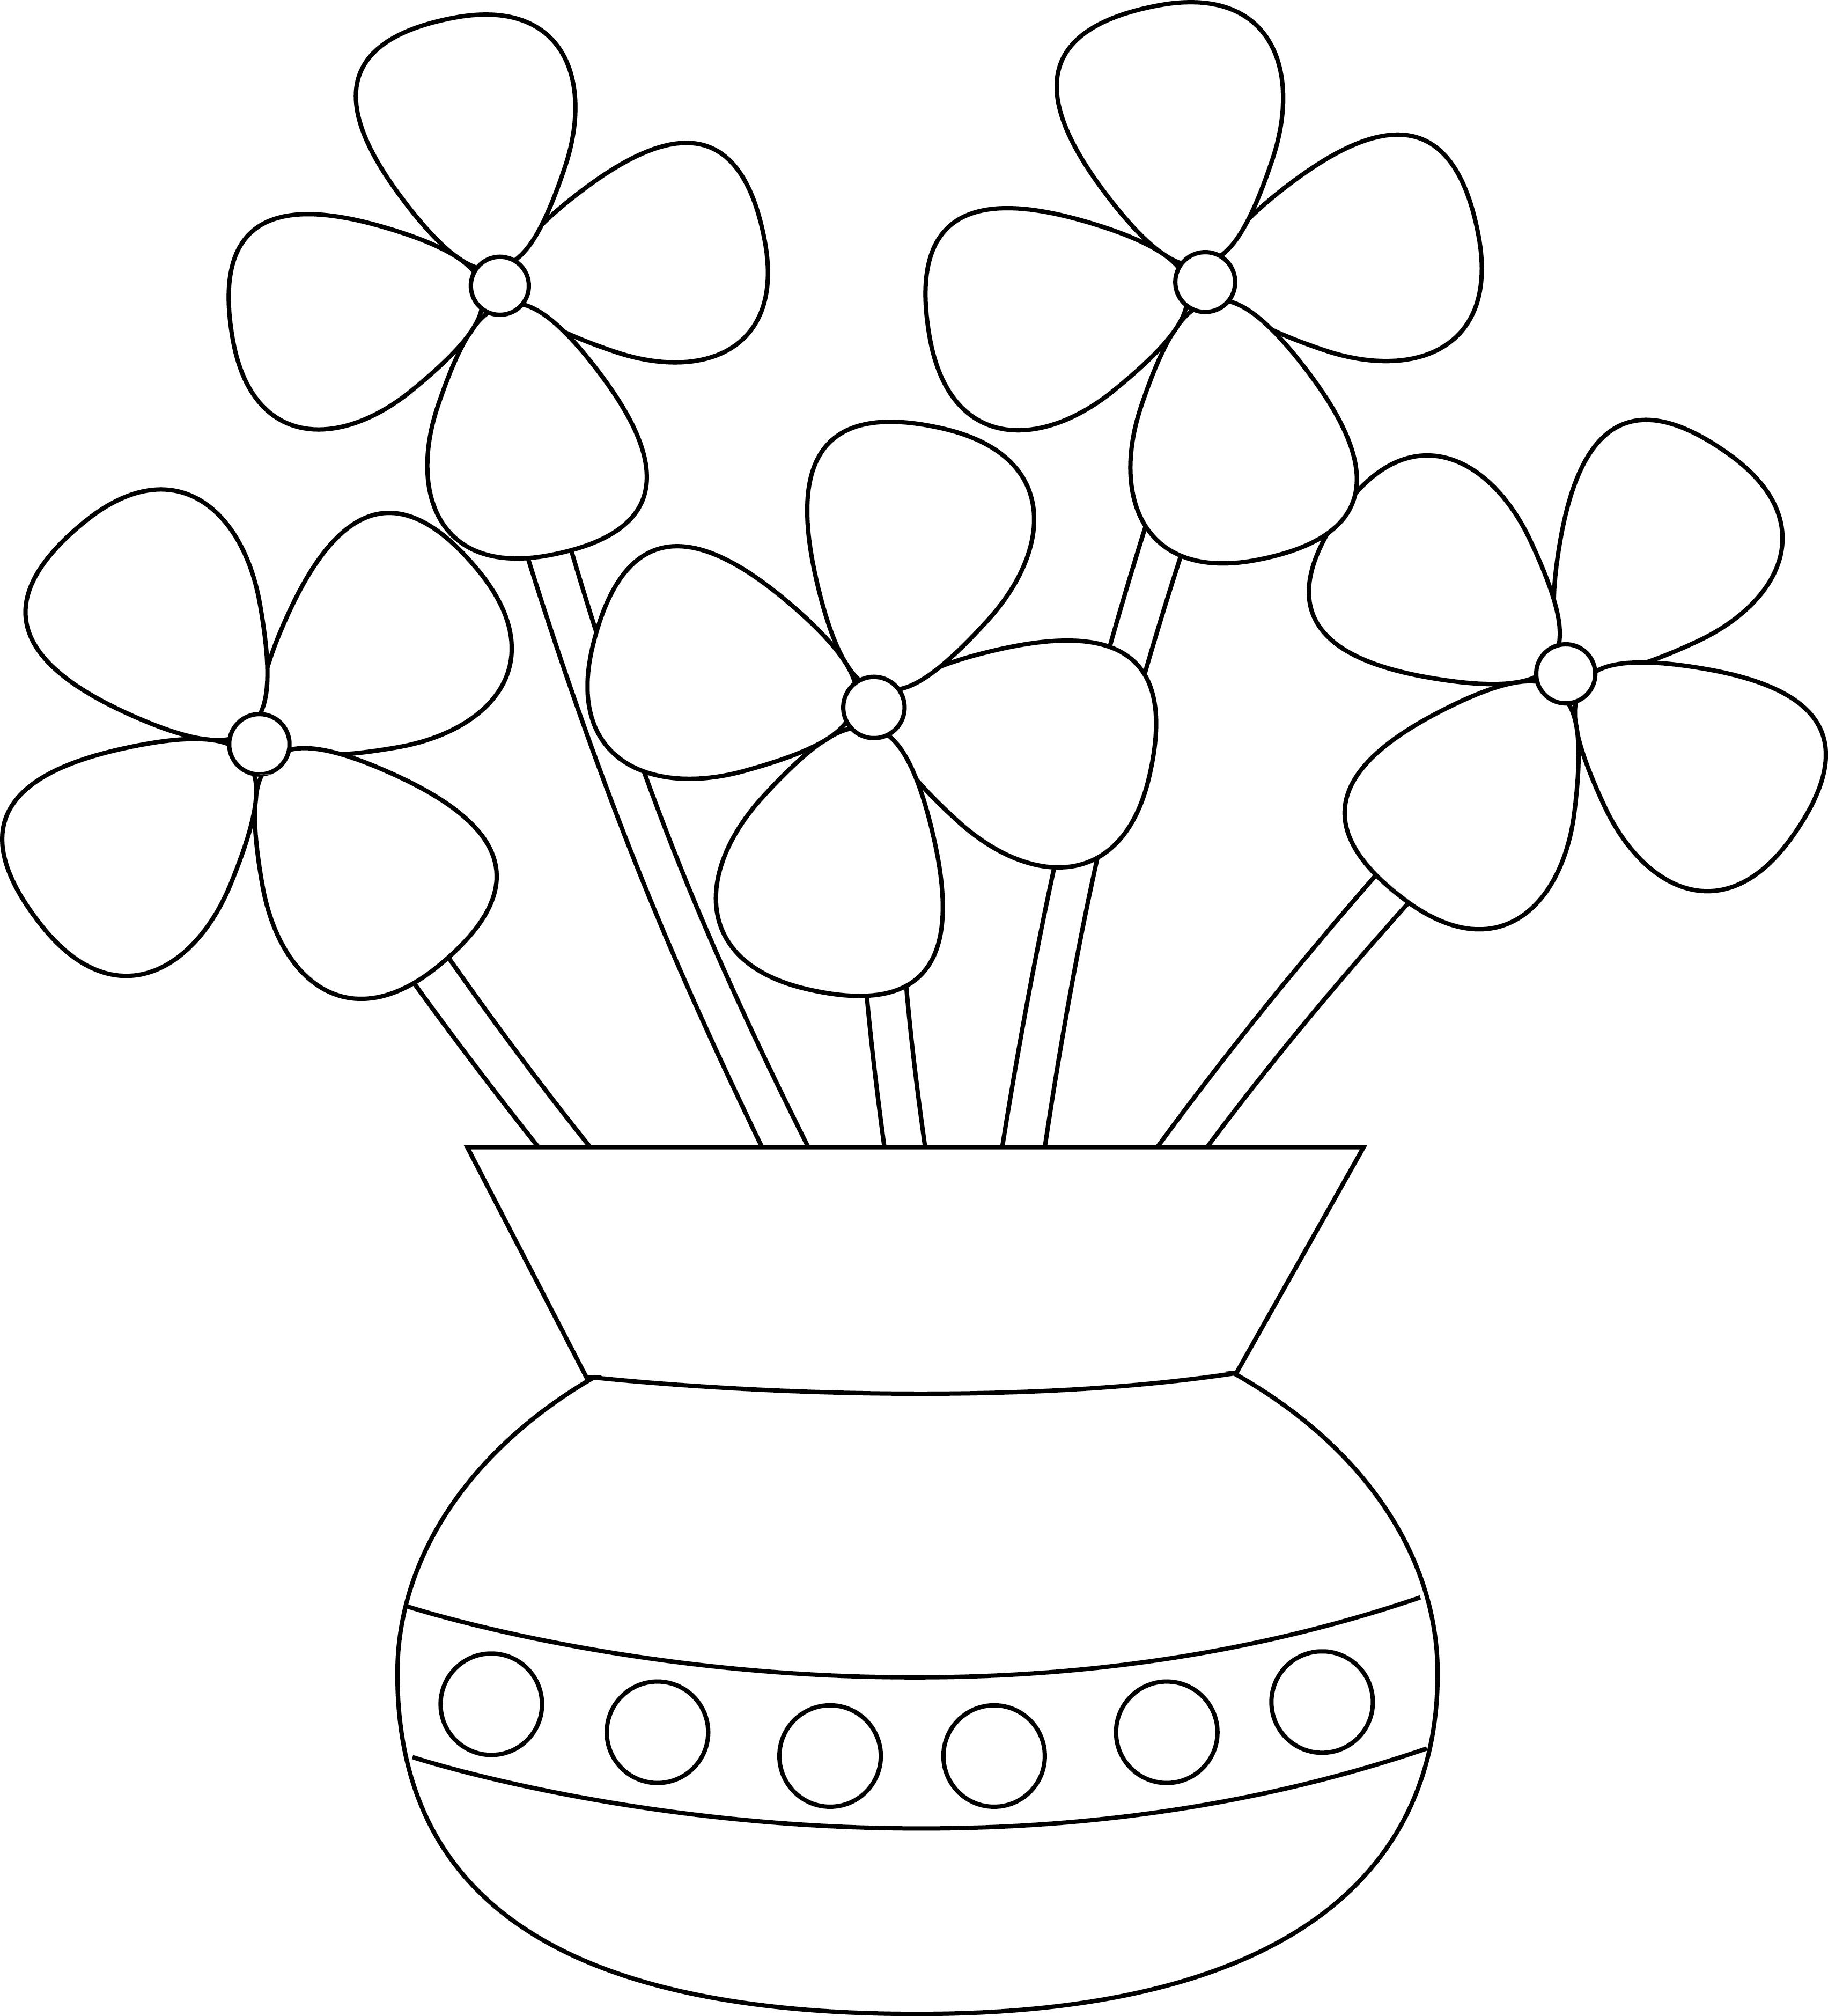 3408x3758 Flower Vase Kids Draw Drawn Vase Flower Vase